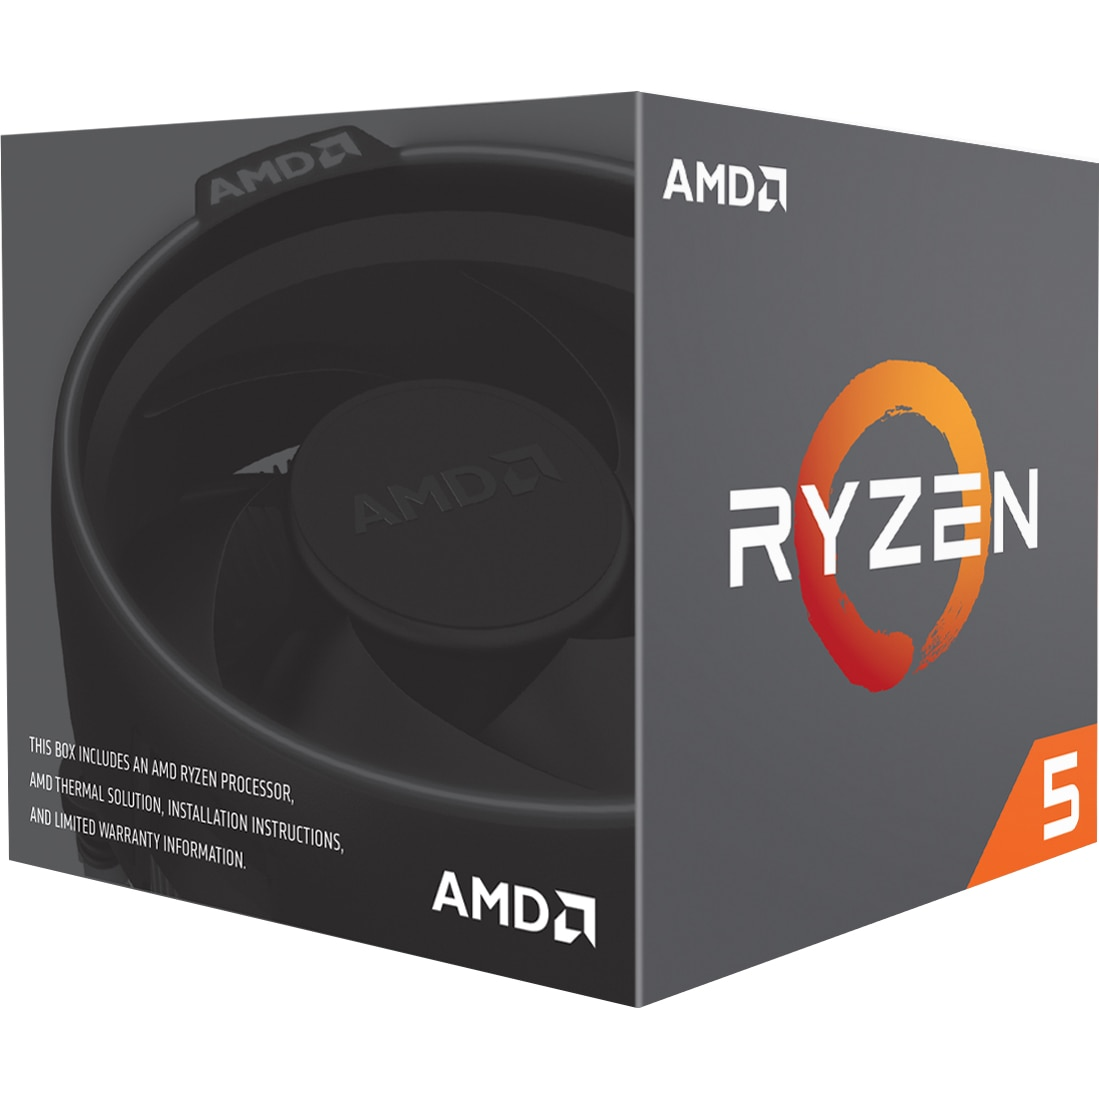 Fotografie Procesor AMD Ryzen 5 2600X, 4.25GHz, 19MB, Socket AM4, Wraith Spire cooler